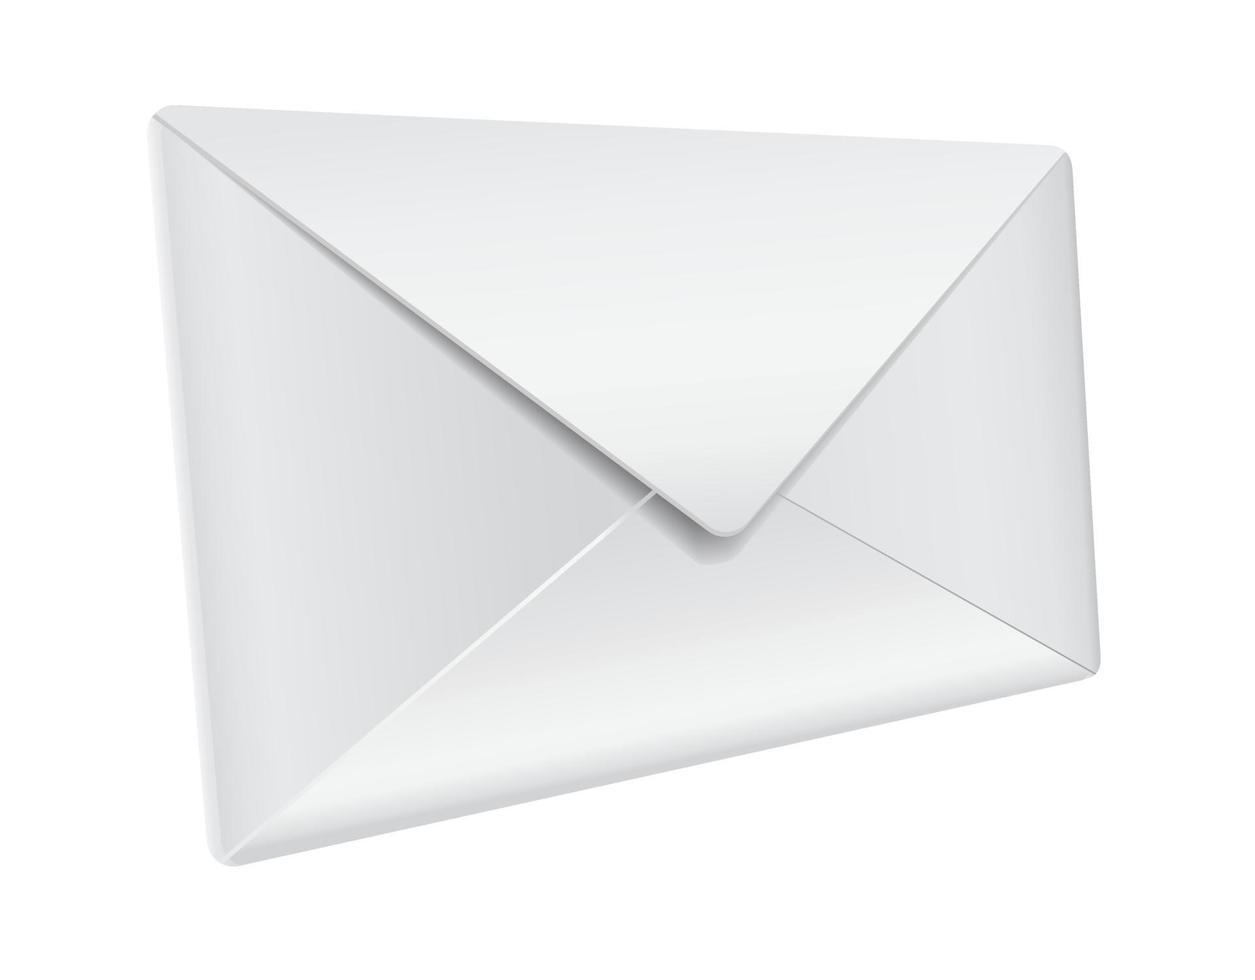 ícone de envelope 3d vetor